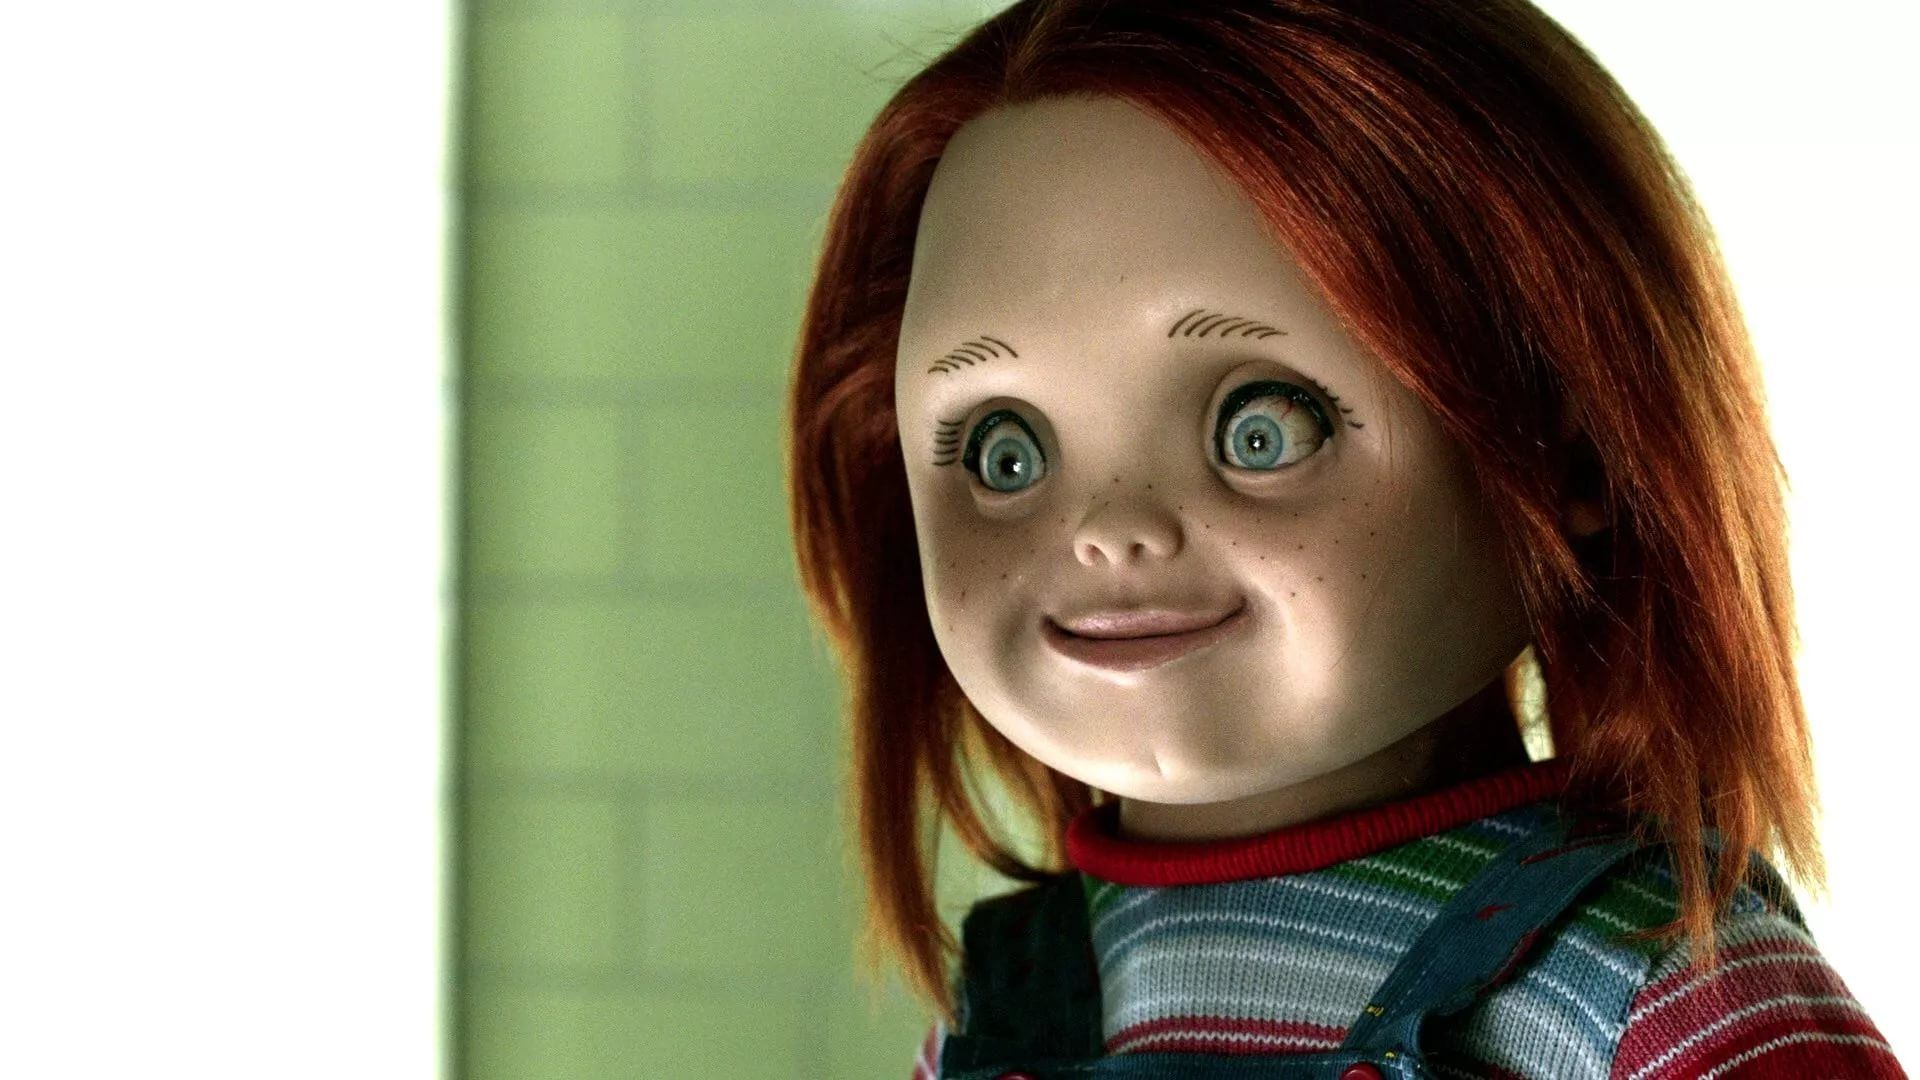 Chucky Doll PC Wallpaper